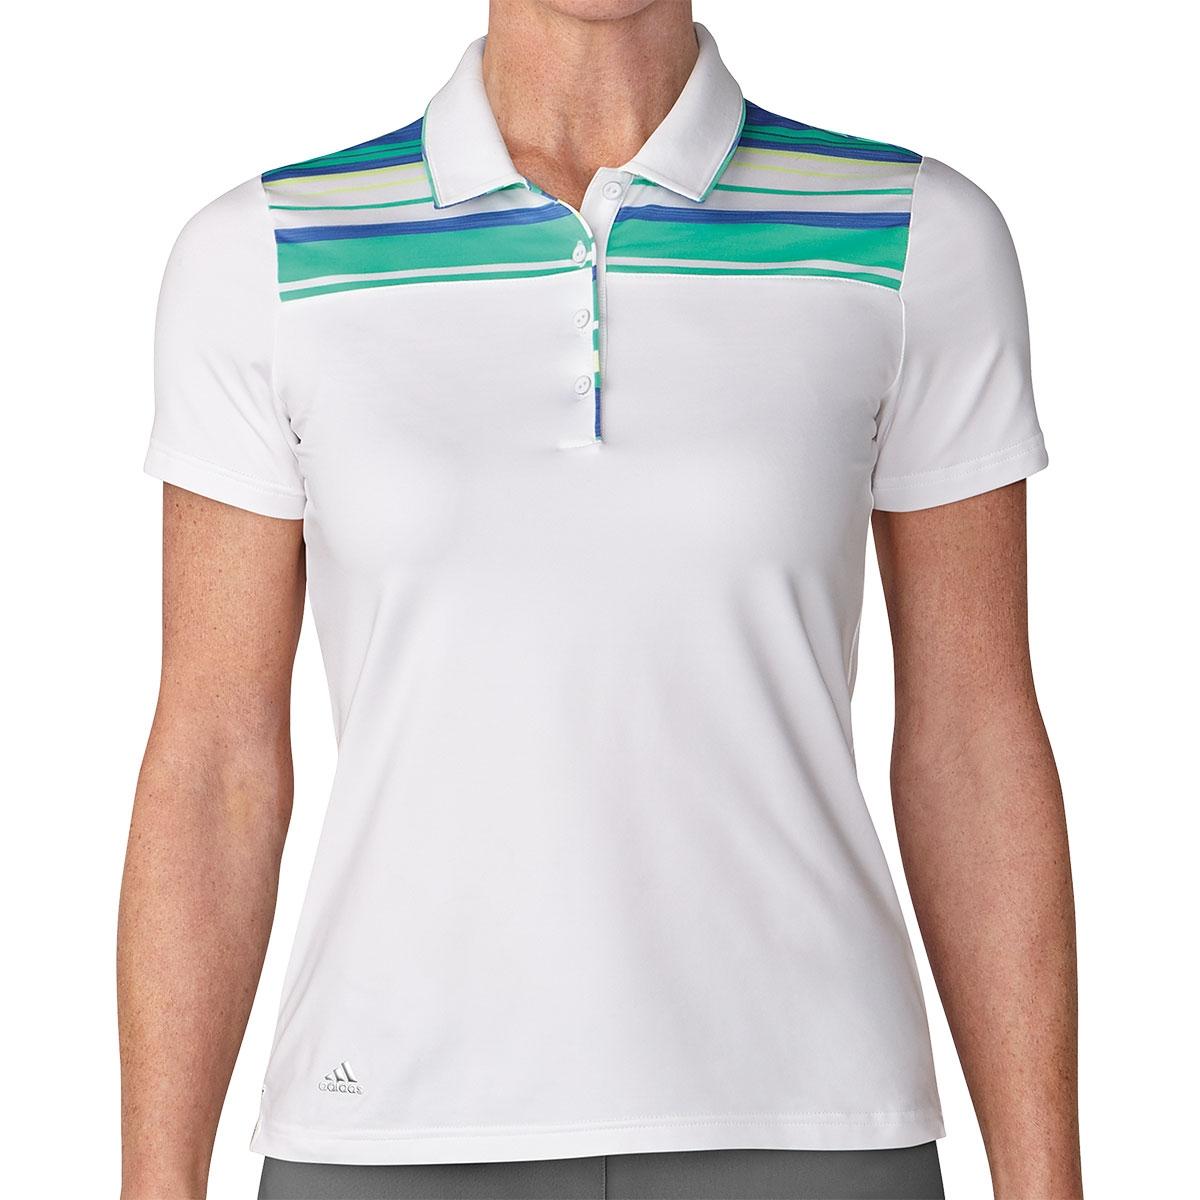 Adidas Womens Ultimate365 Merch Stripe White/Green Polo